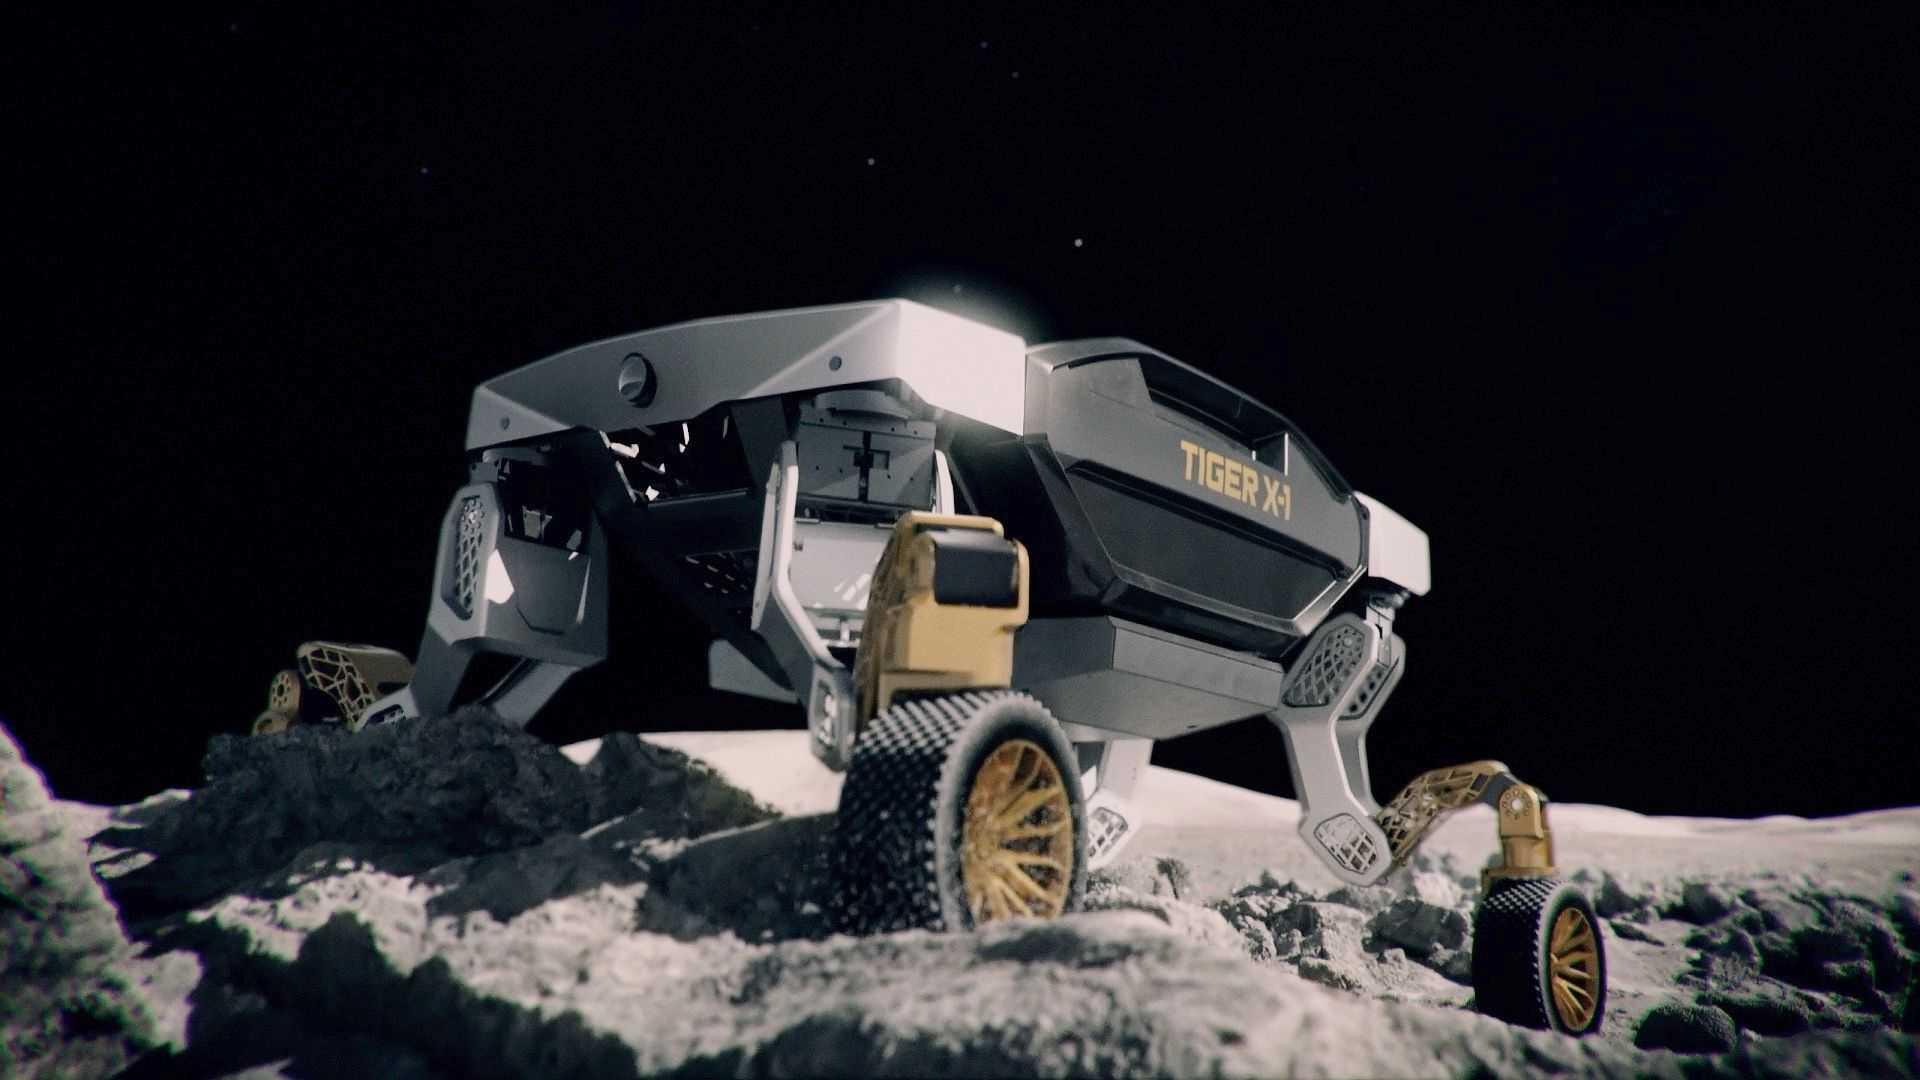 https://cdn.motor1.com/images/mgl/NYpEM/s6/hyundai-tiger-x-1-ultimate-mobility-vehicle-on-moon.jpg